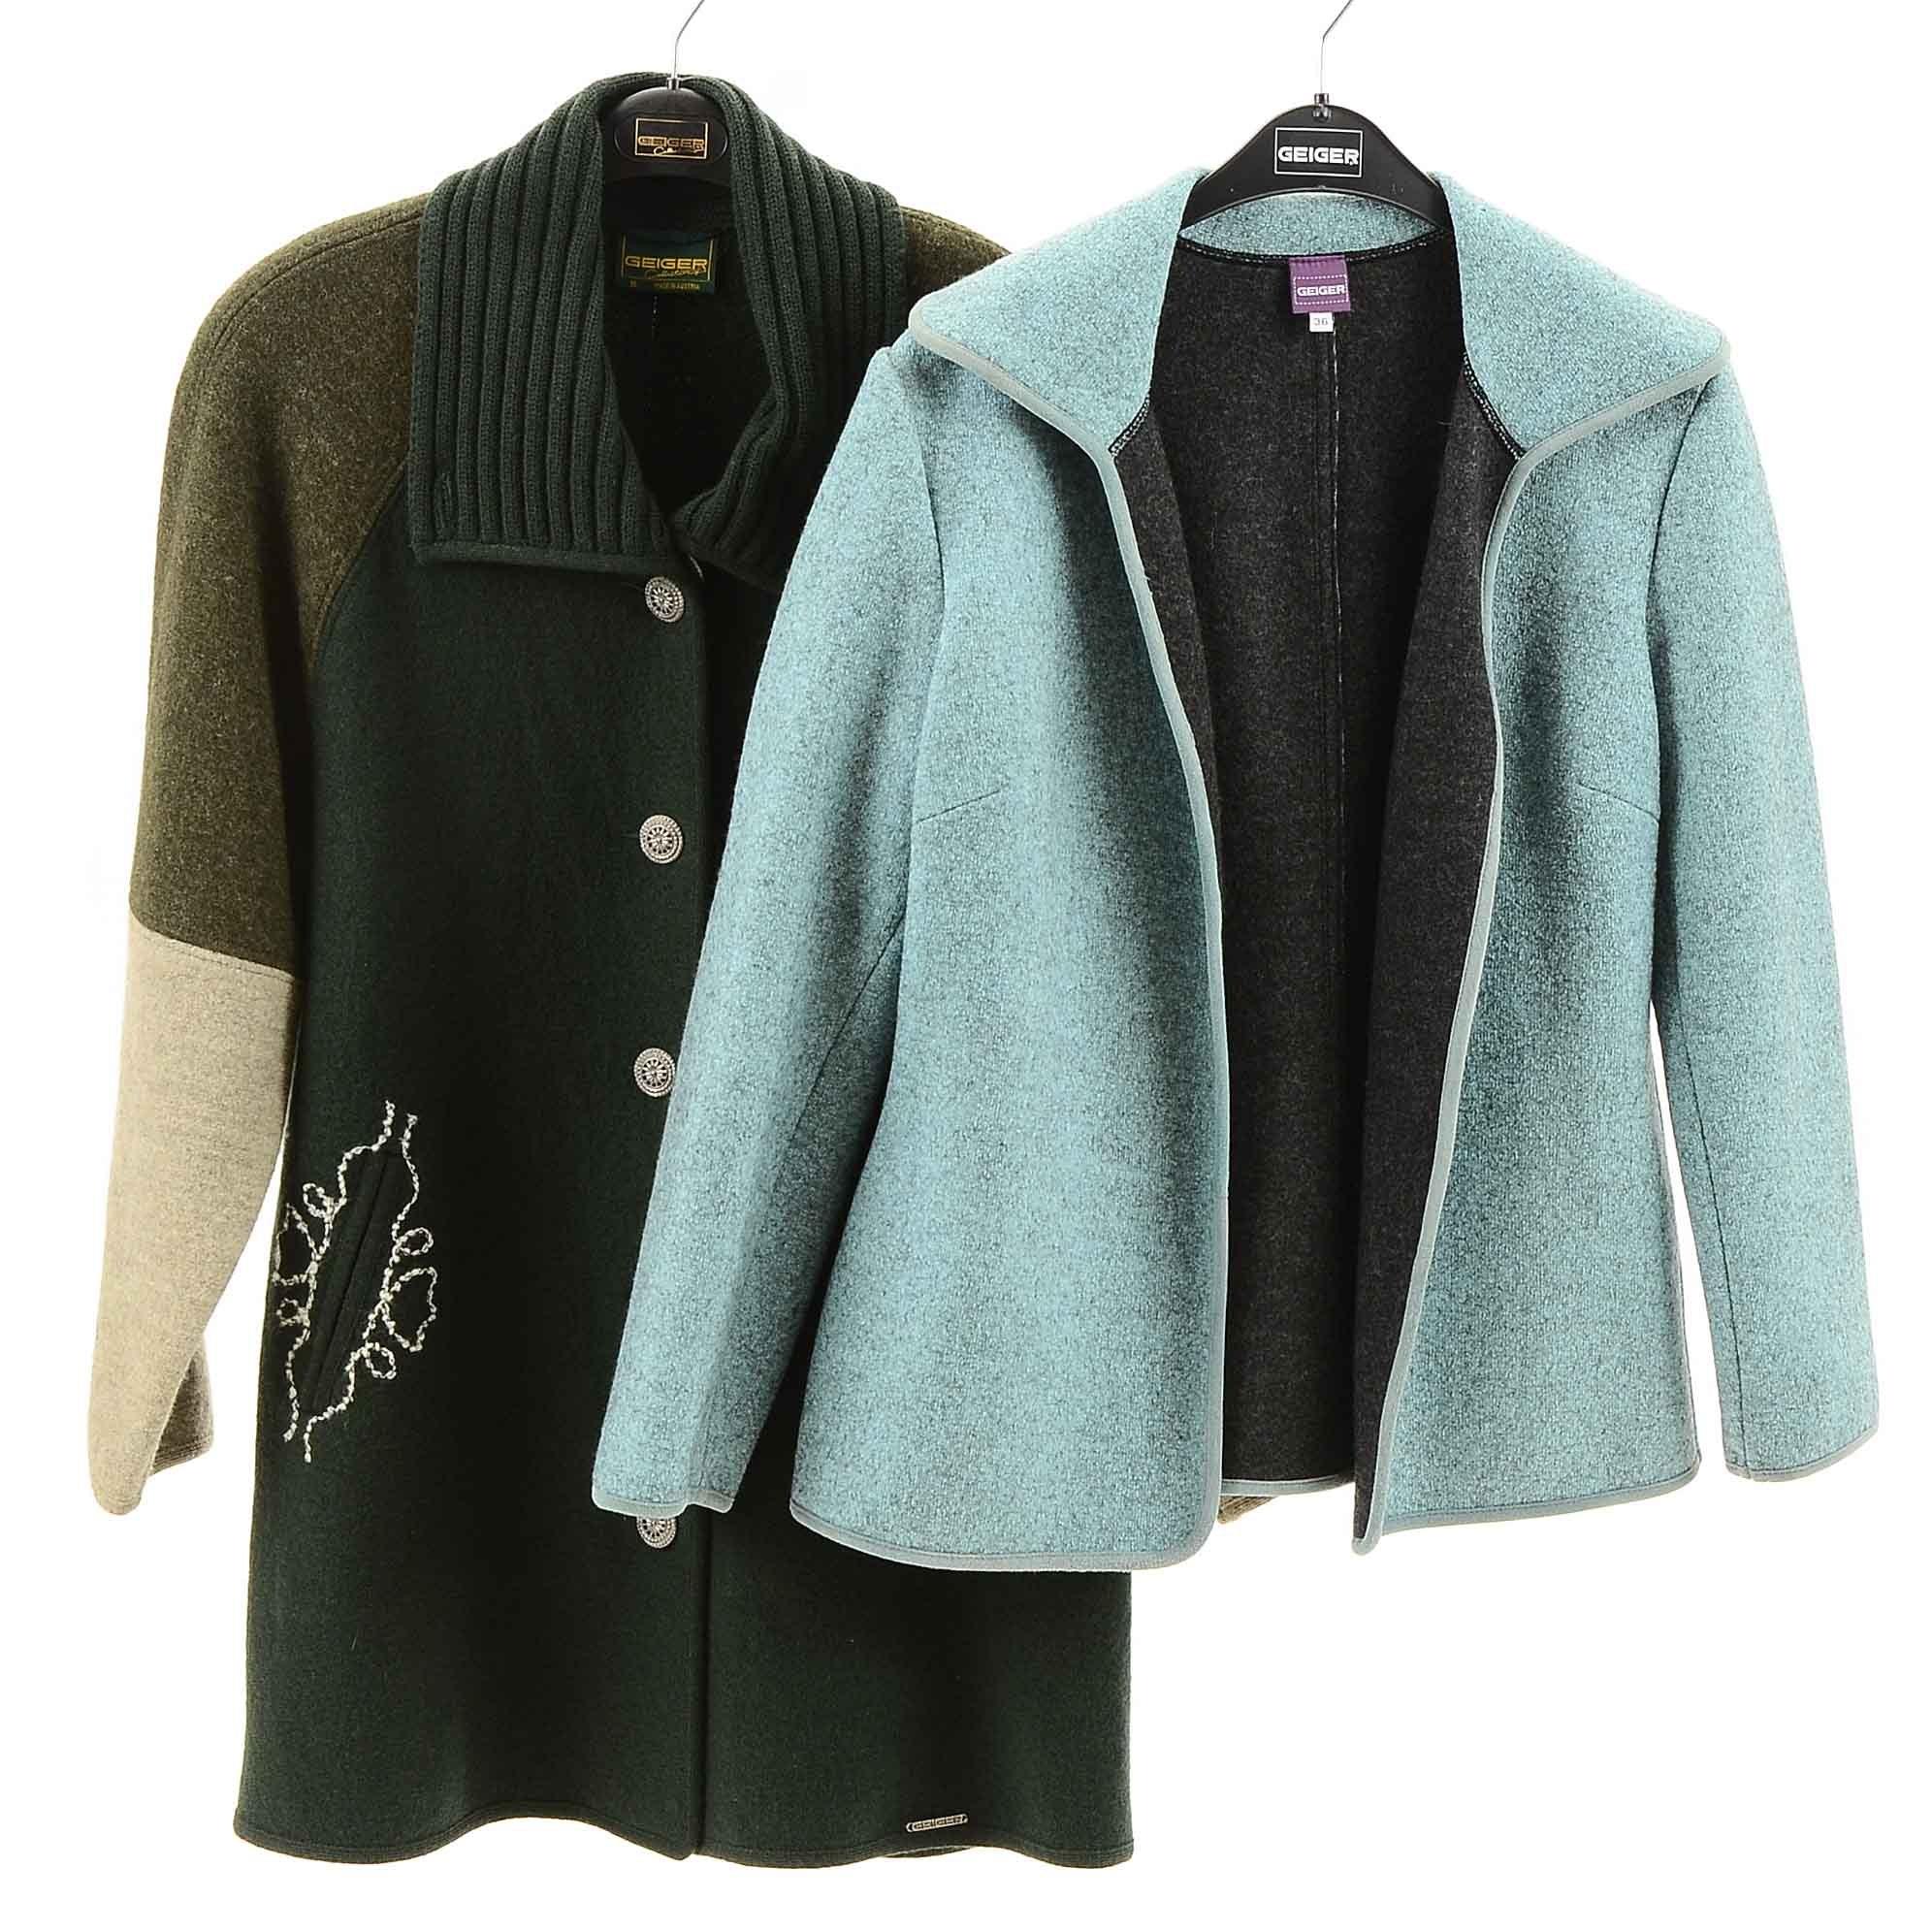 Women's Geiger Light Blue and Olive Coats